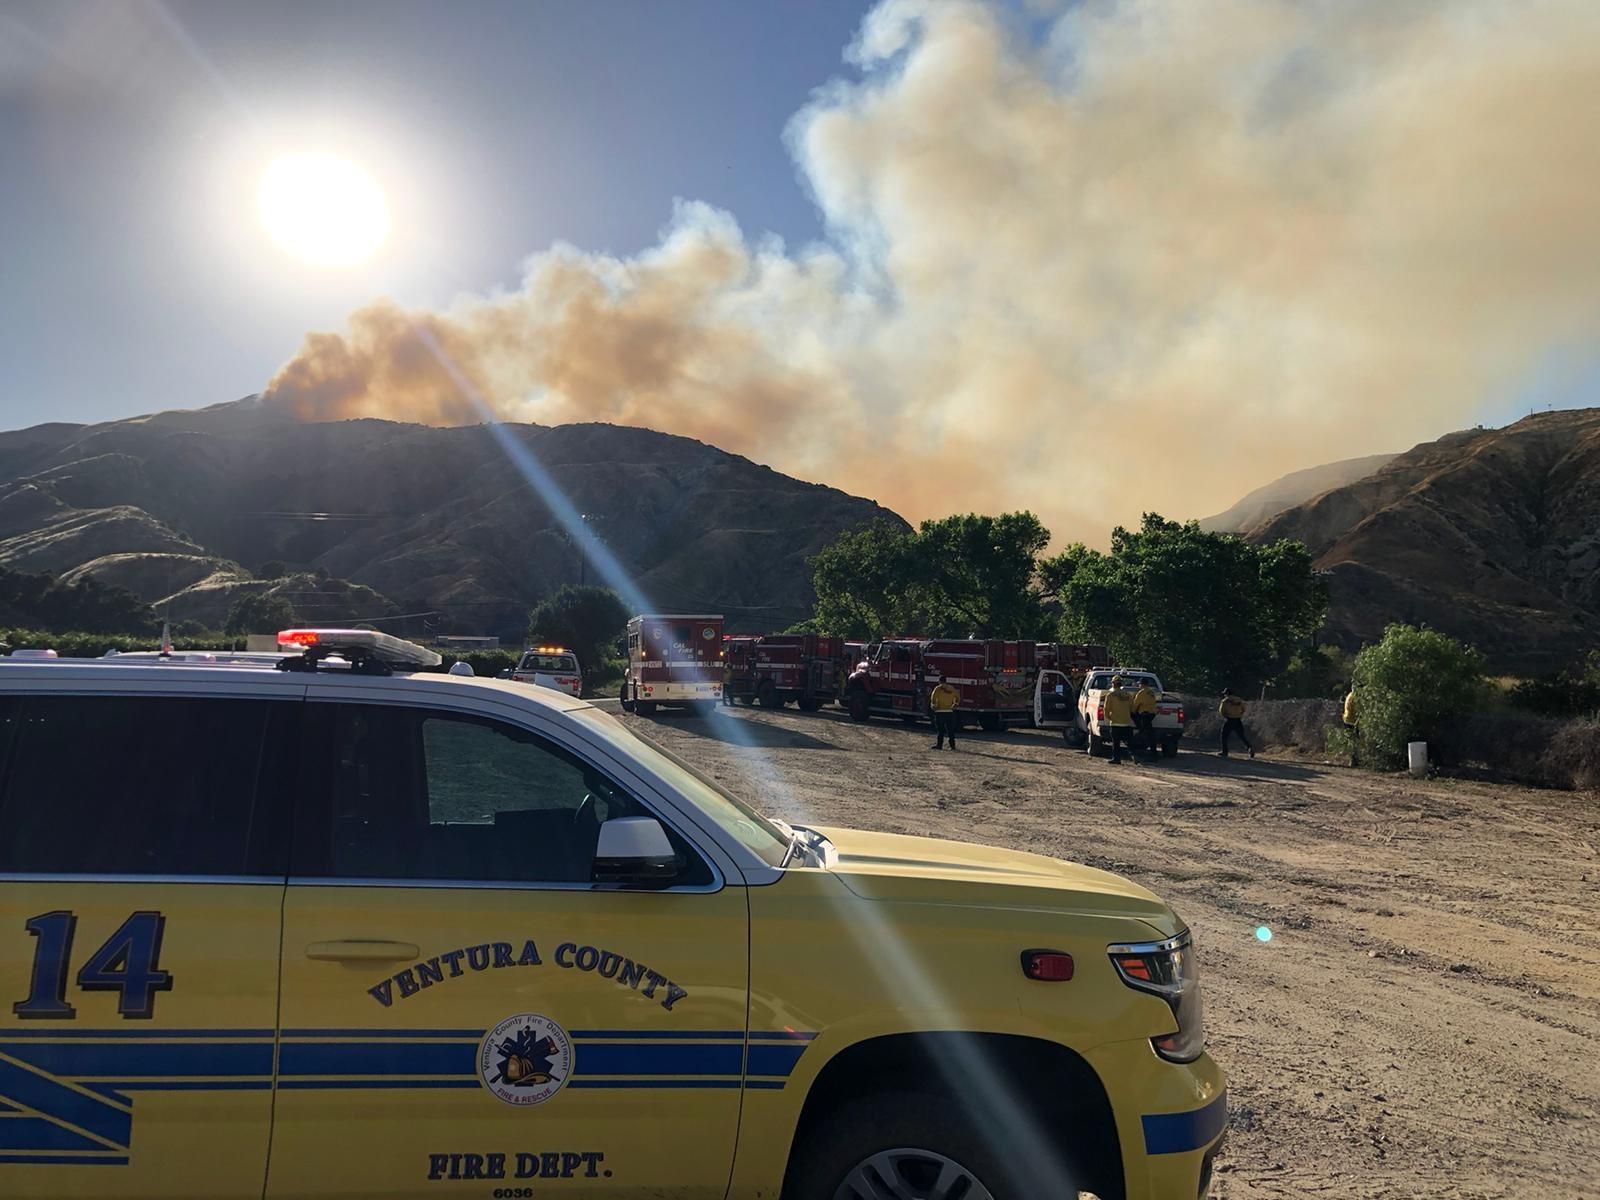 Smoke billows as the Lime Fire burns near Lake Piru on June 13, 2020. (Ventura County Fire Department)